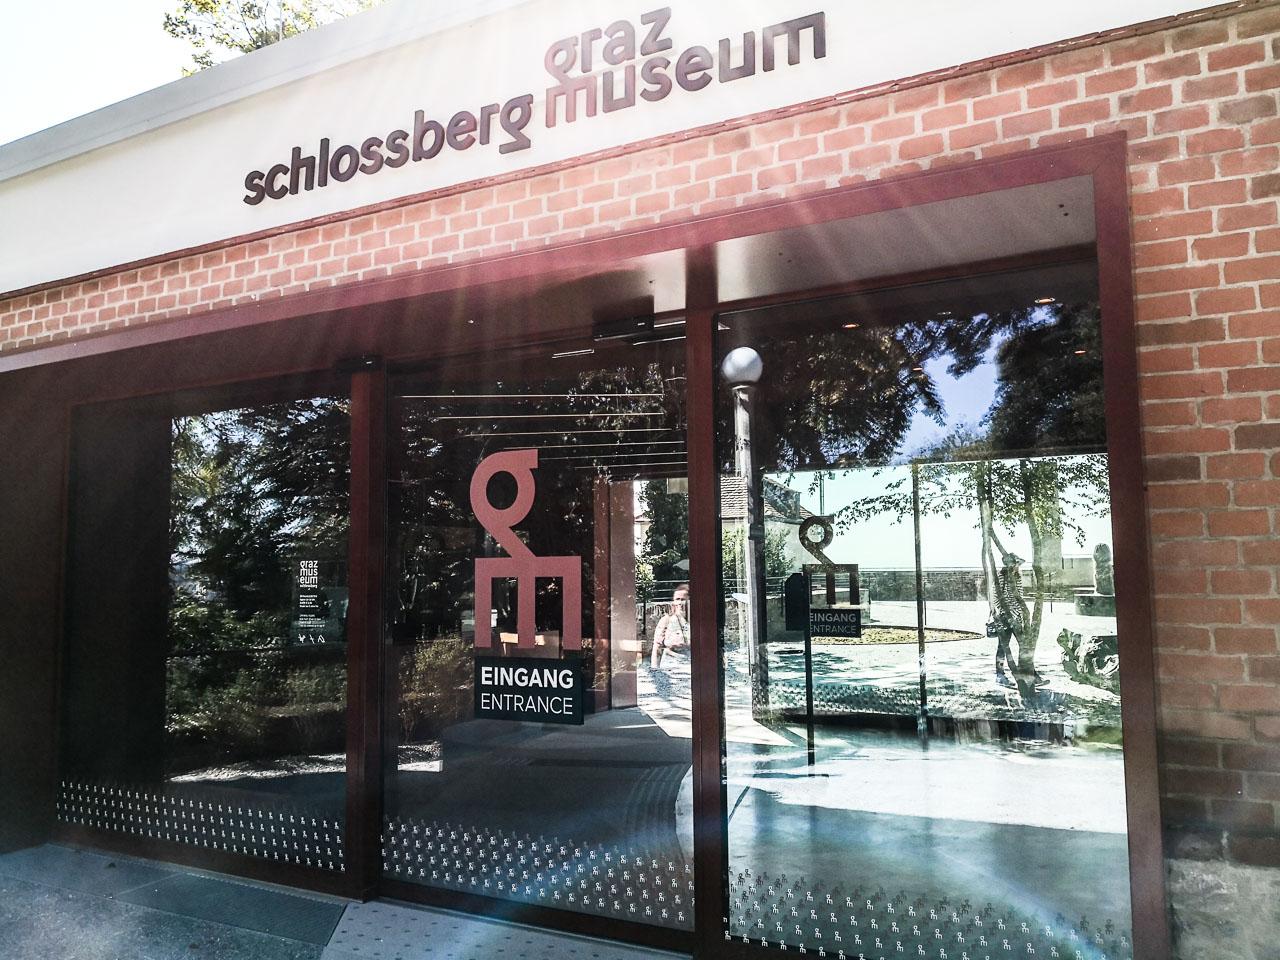 Schlossbergmuseum